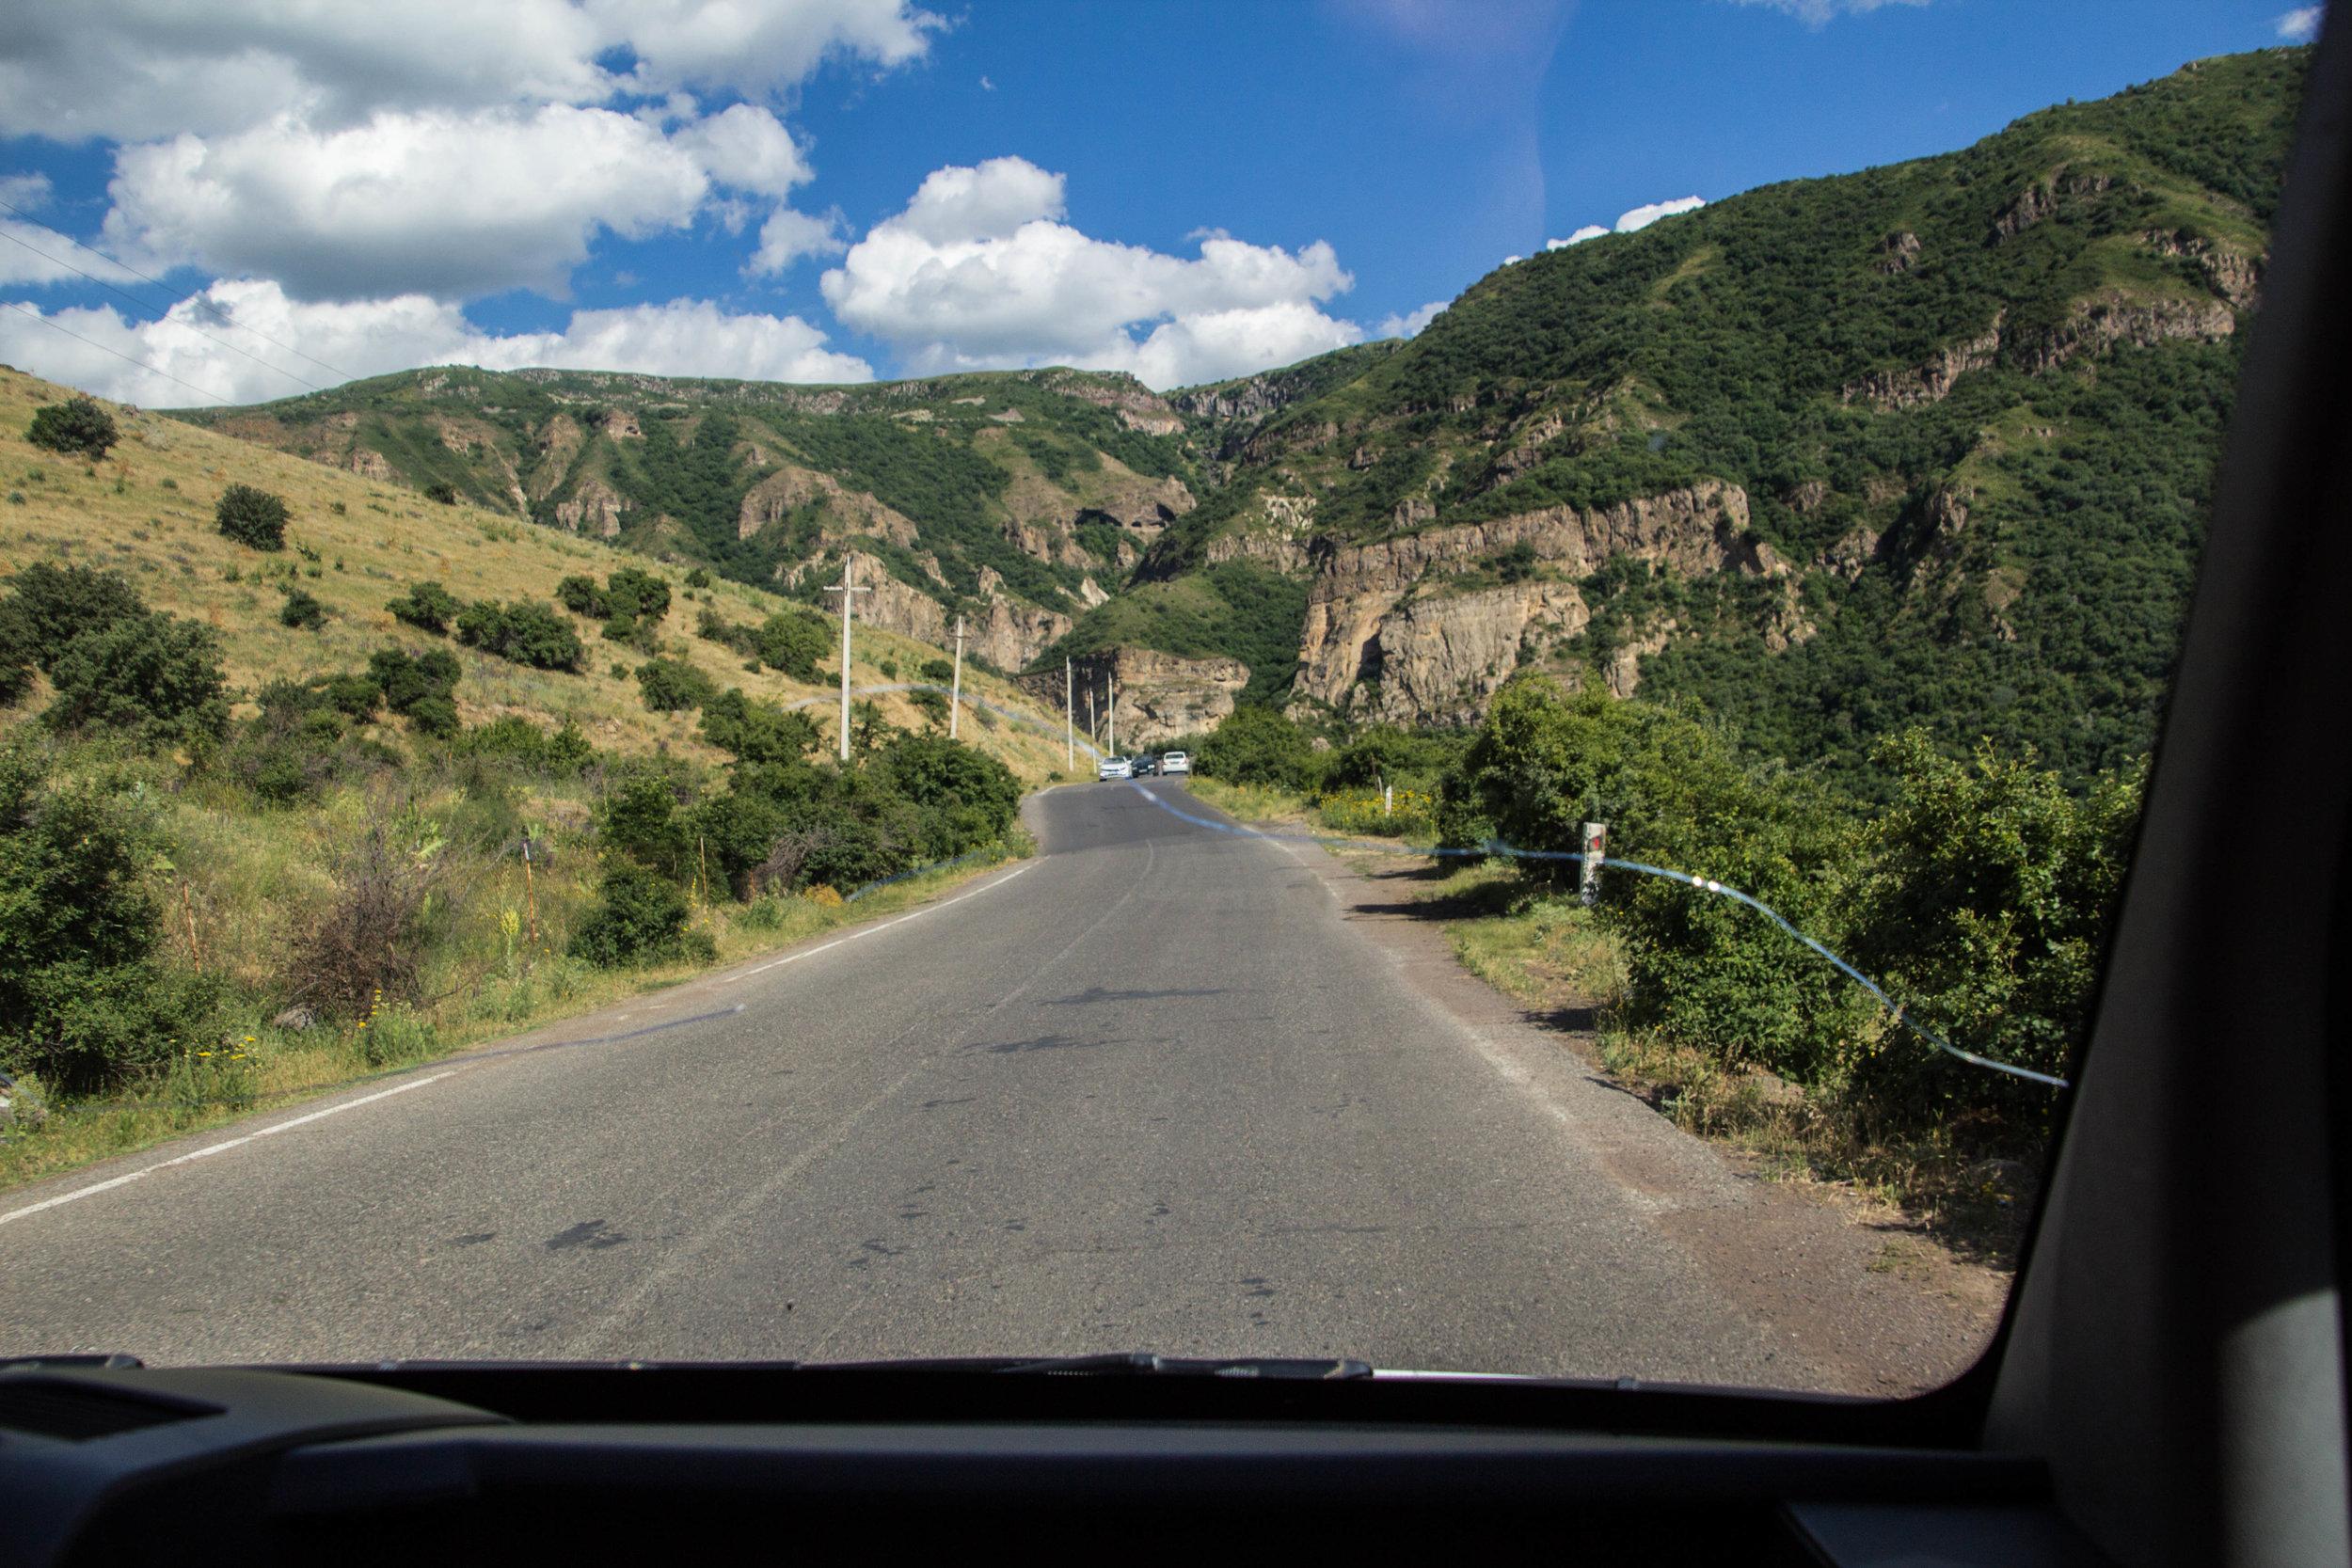 roads-armenia-11.jpg